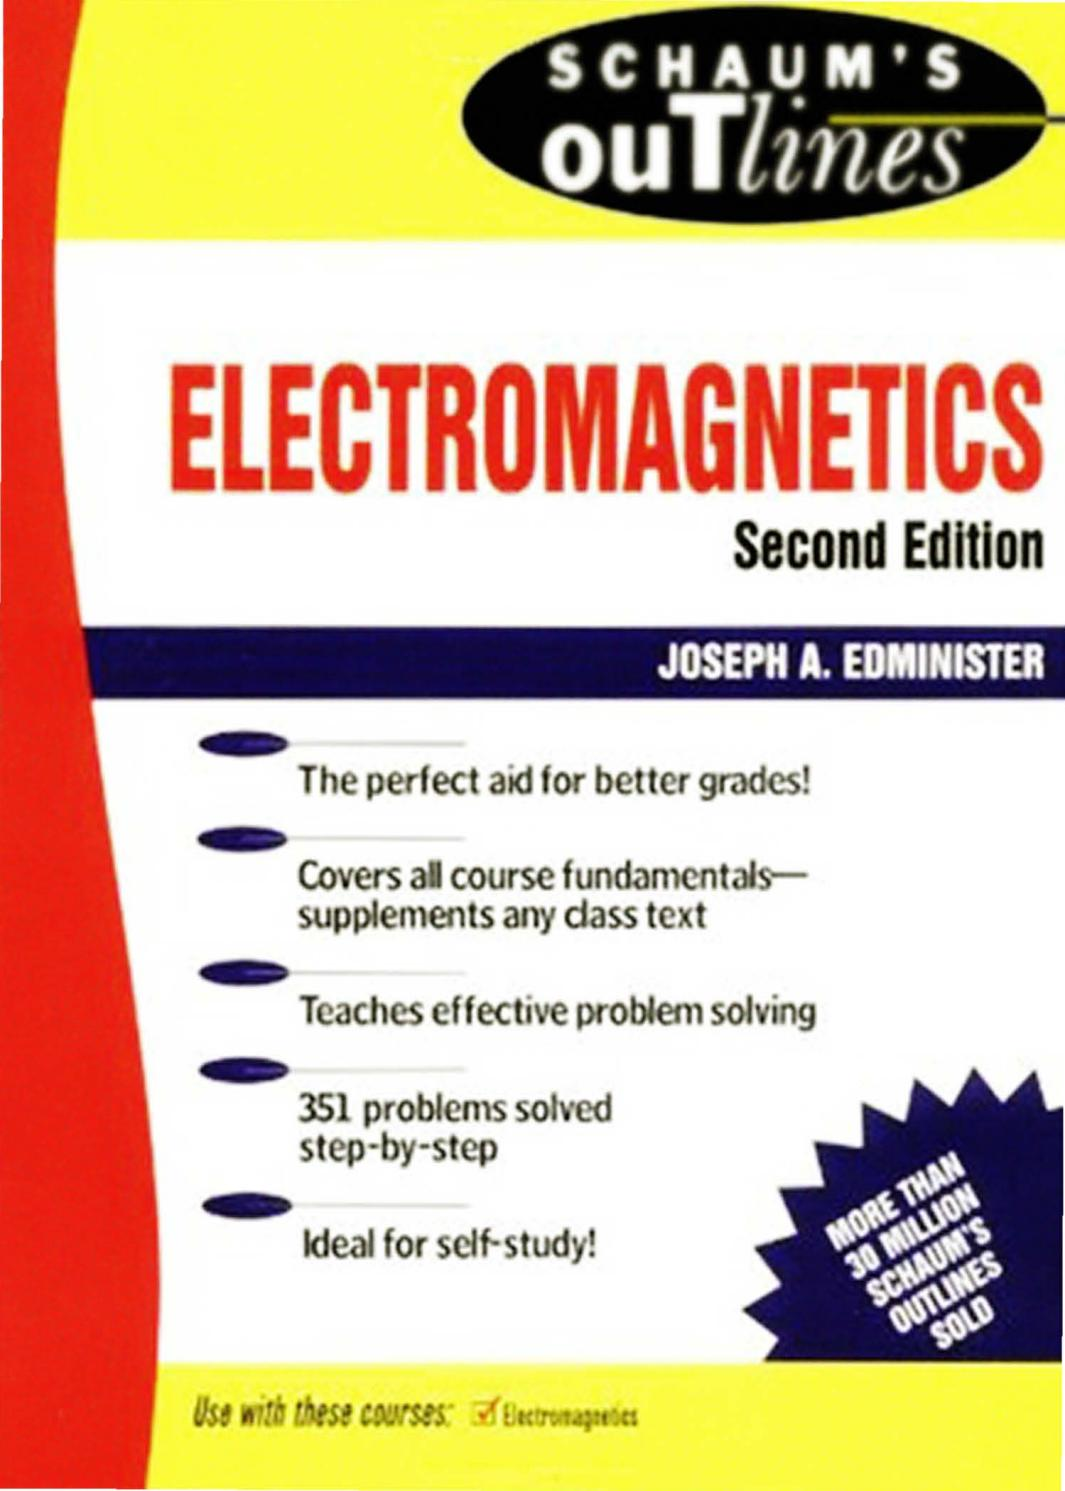 Electromagnetics - Schaum - 2nd Edition - Joseph A